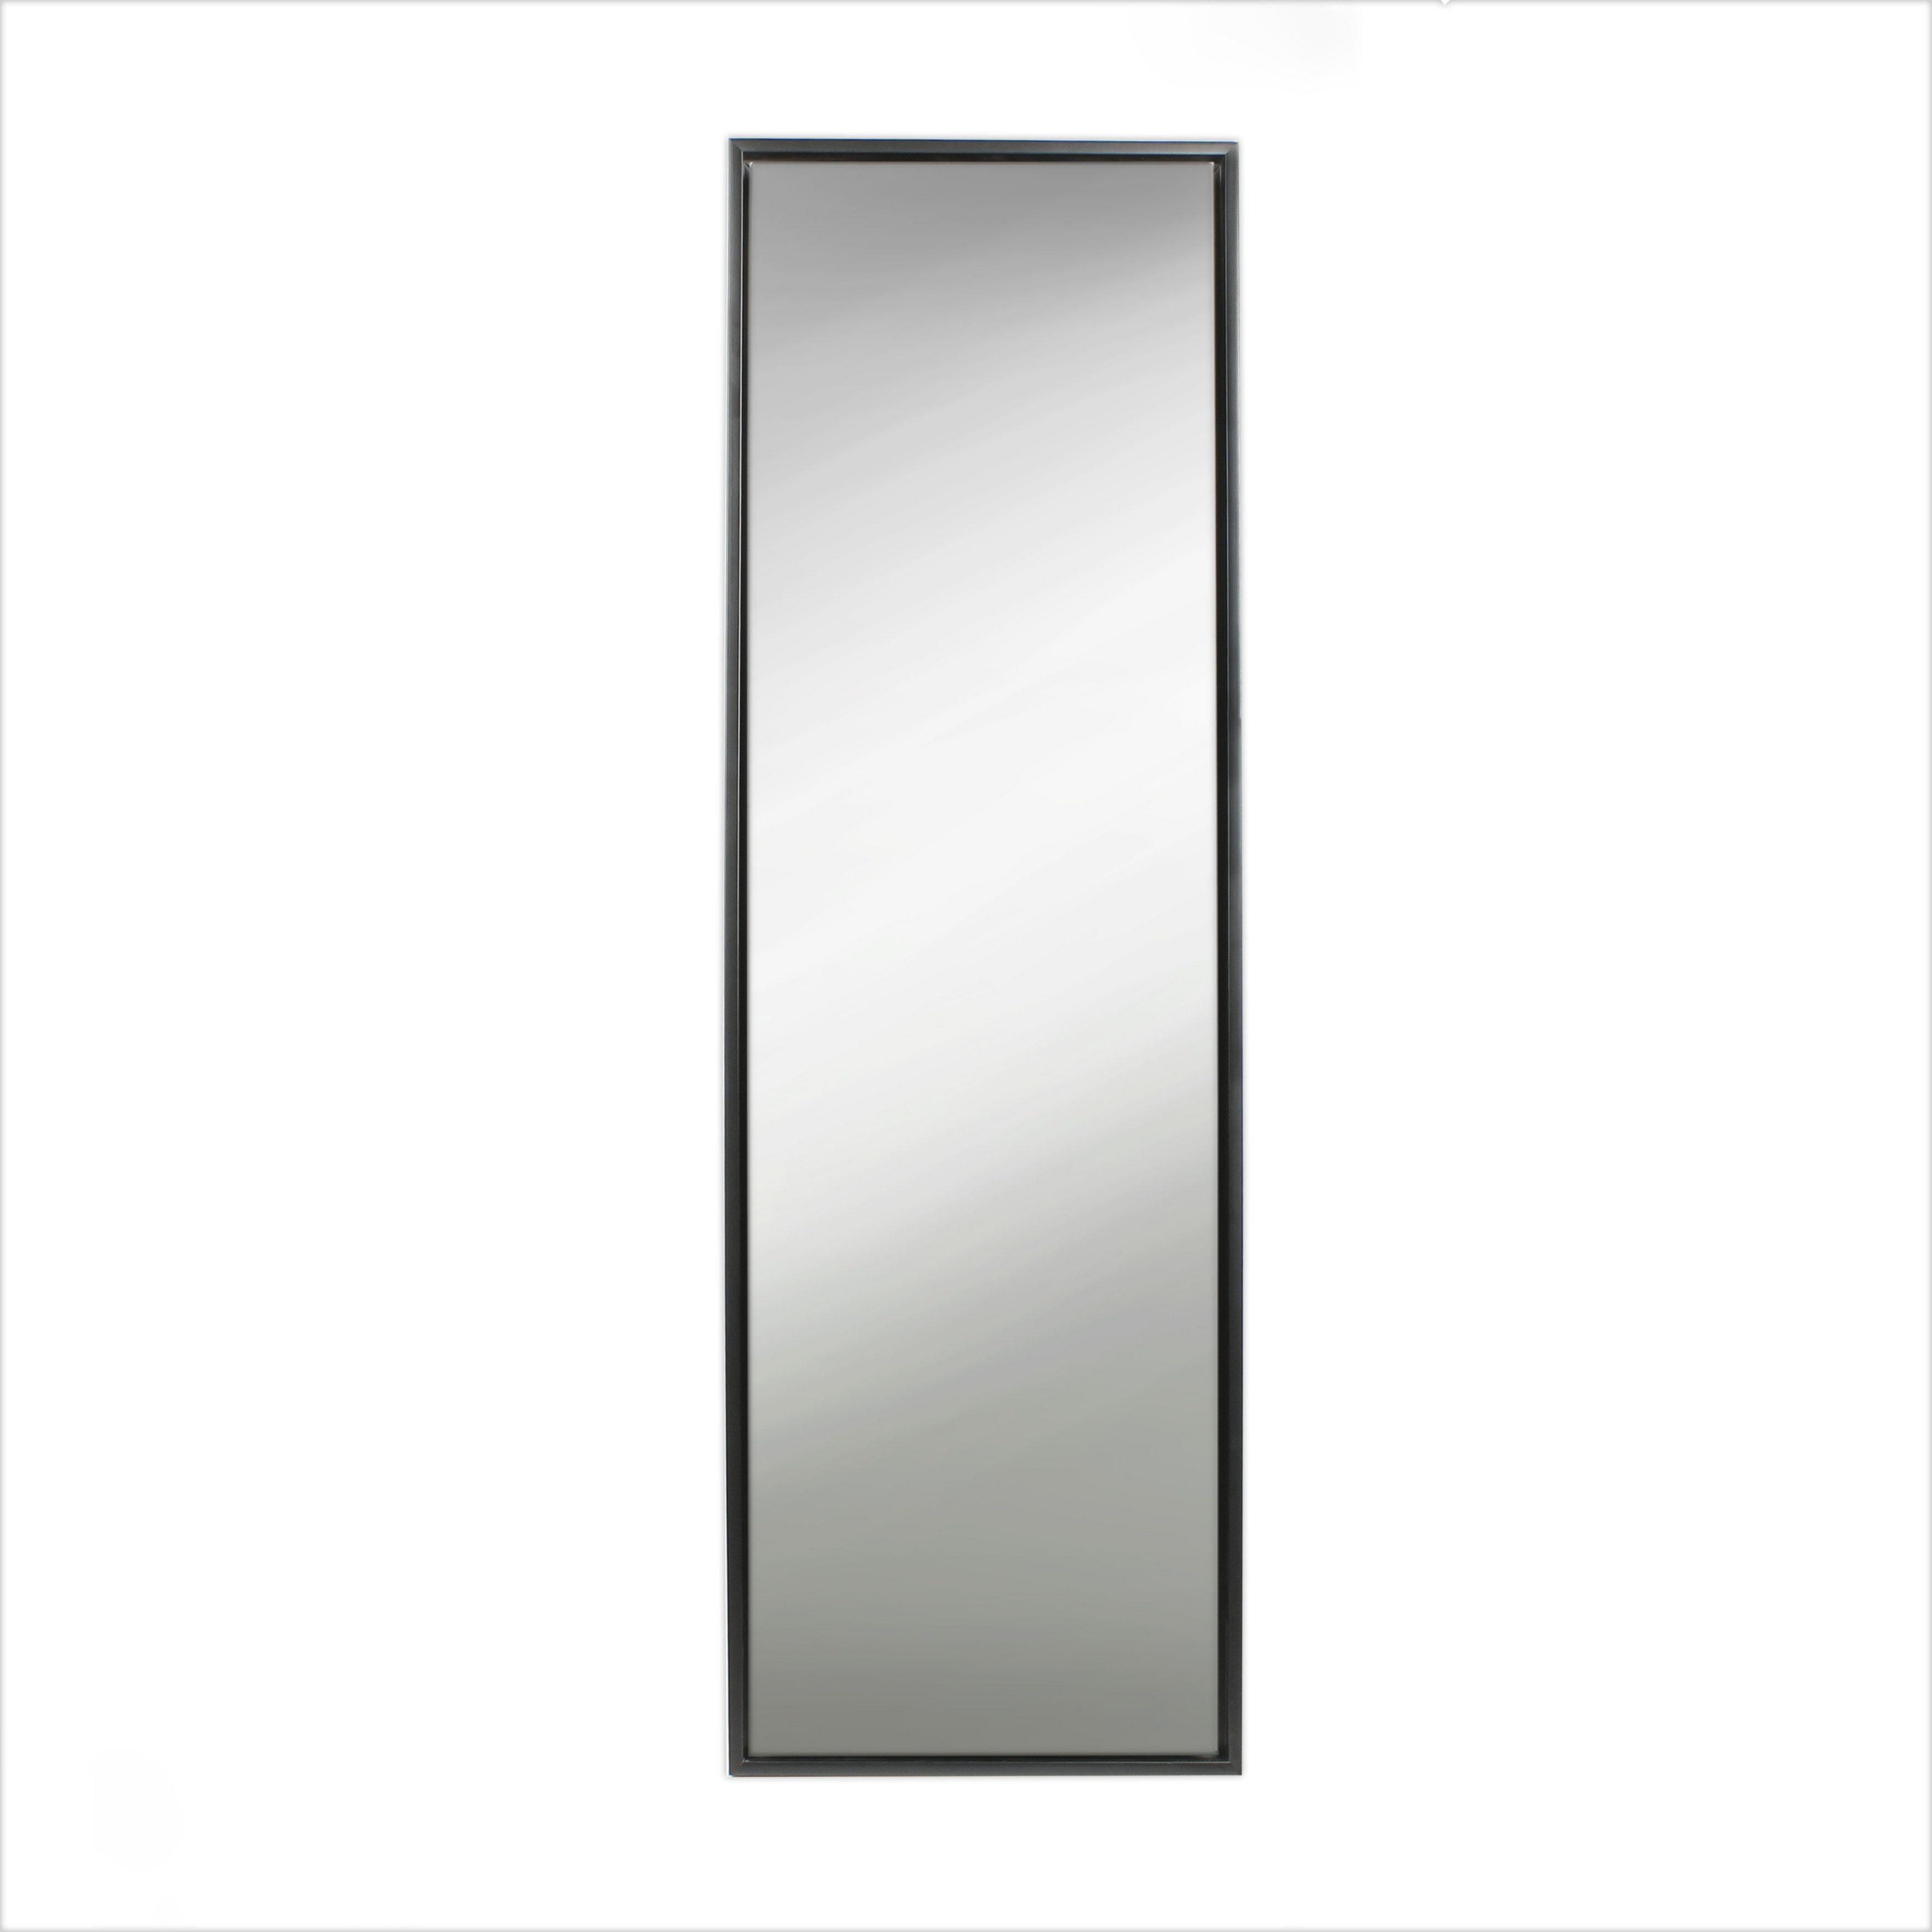 Brayden Studio Whitakers Full Length Mirror | Wayfair